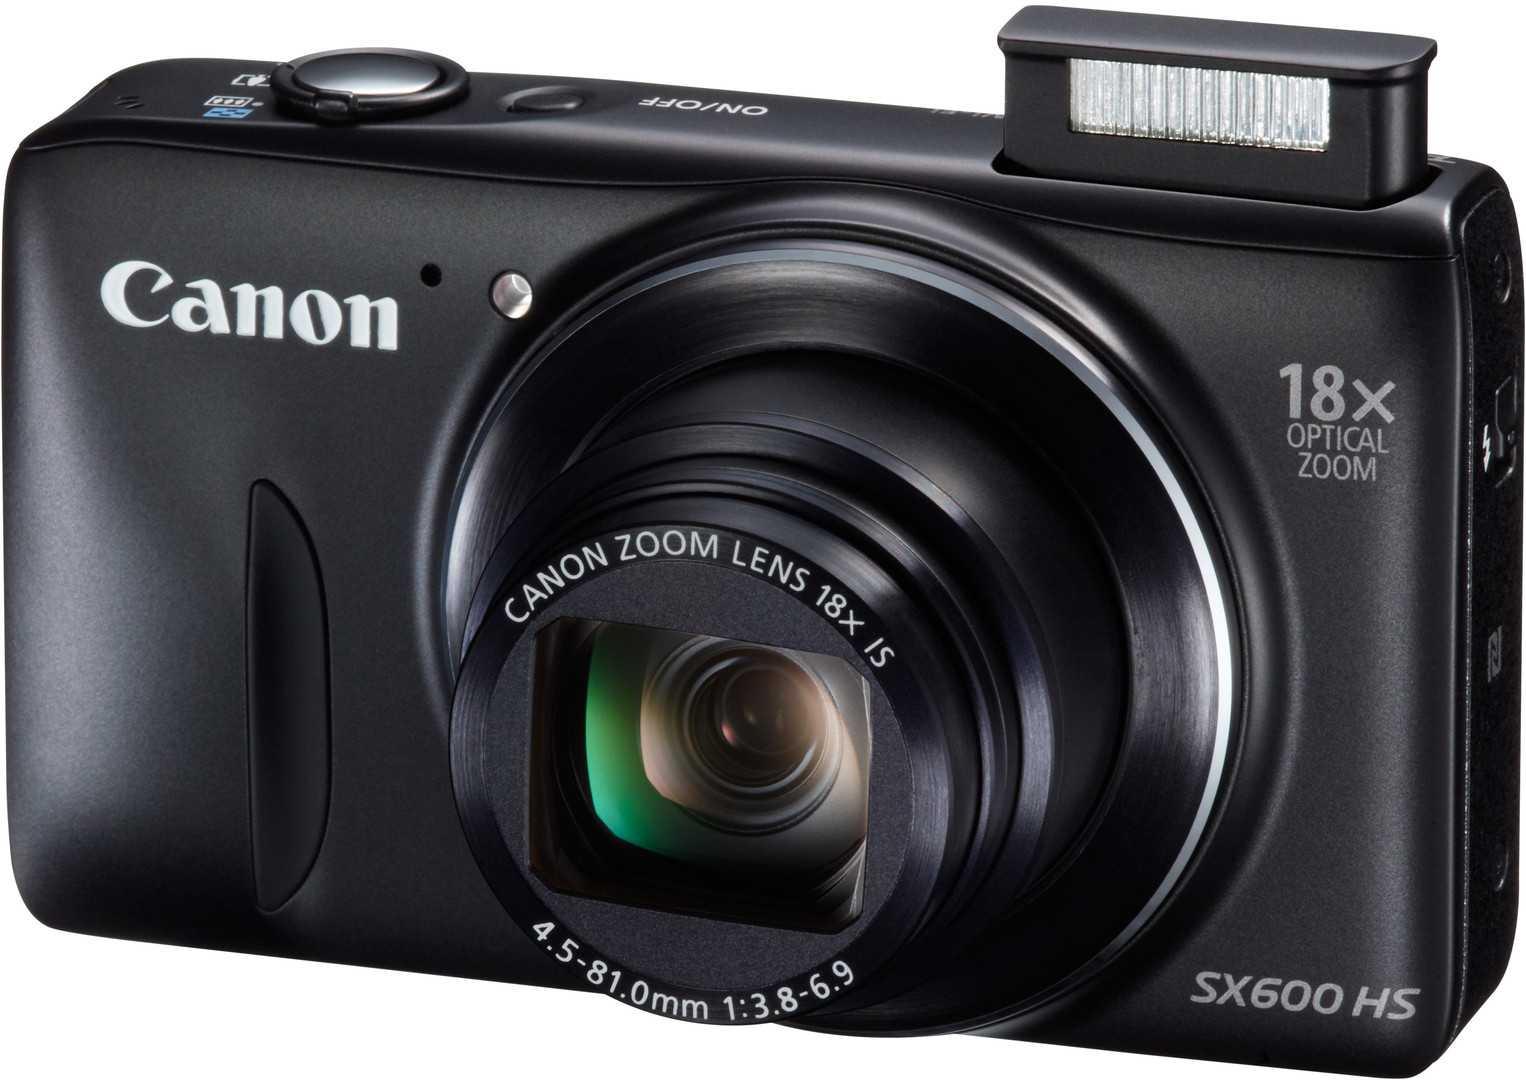 Canon Sx600 Hs Digital Camera Price In Bangladesh Ac